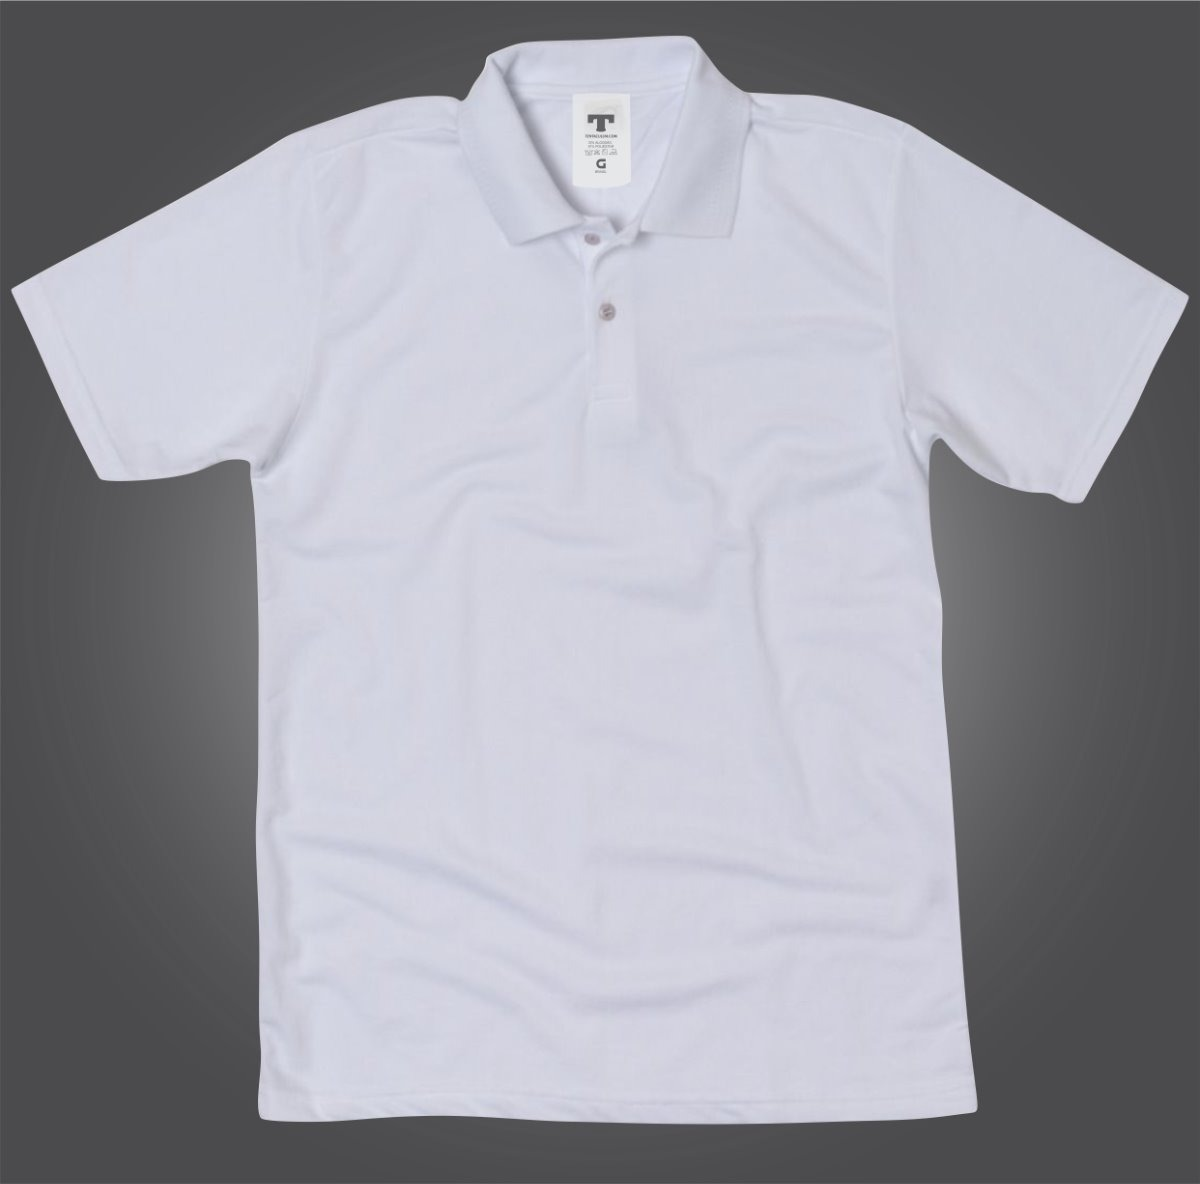 polo camisetas masculina camiseta feminino camisa uniforme. Carregando zoom. ca7bdc883c093